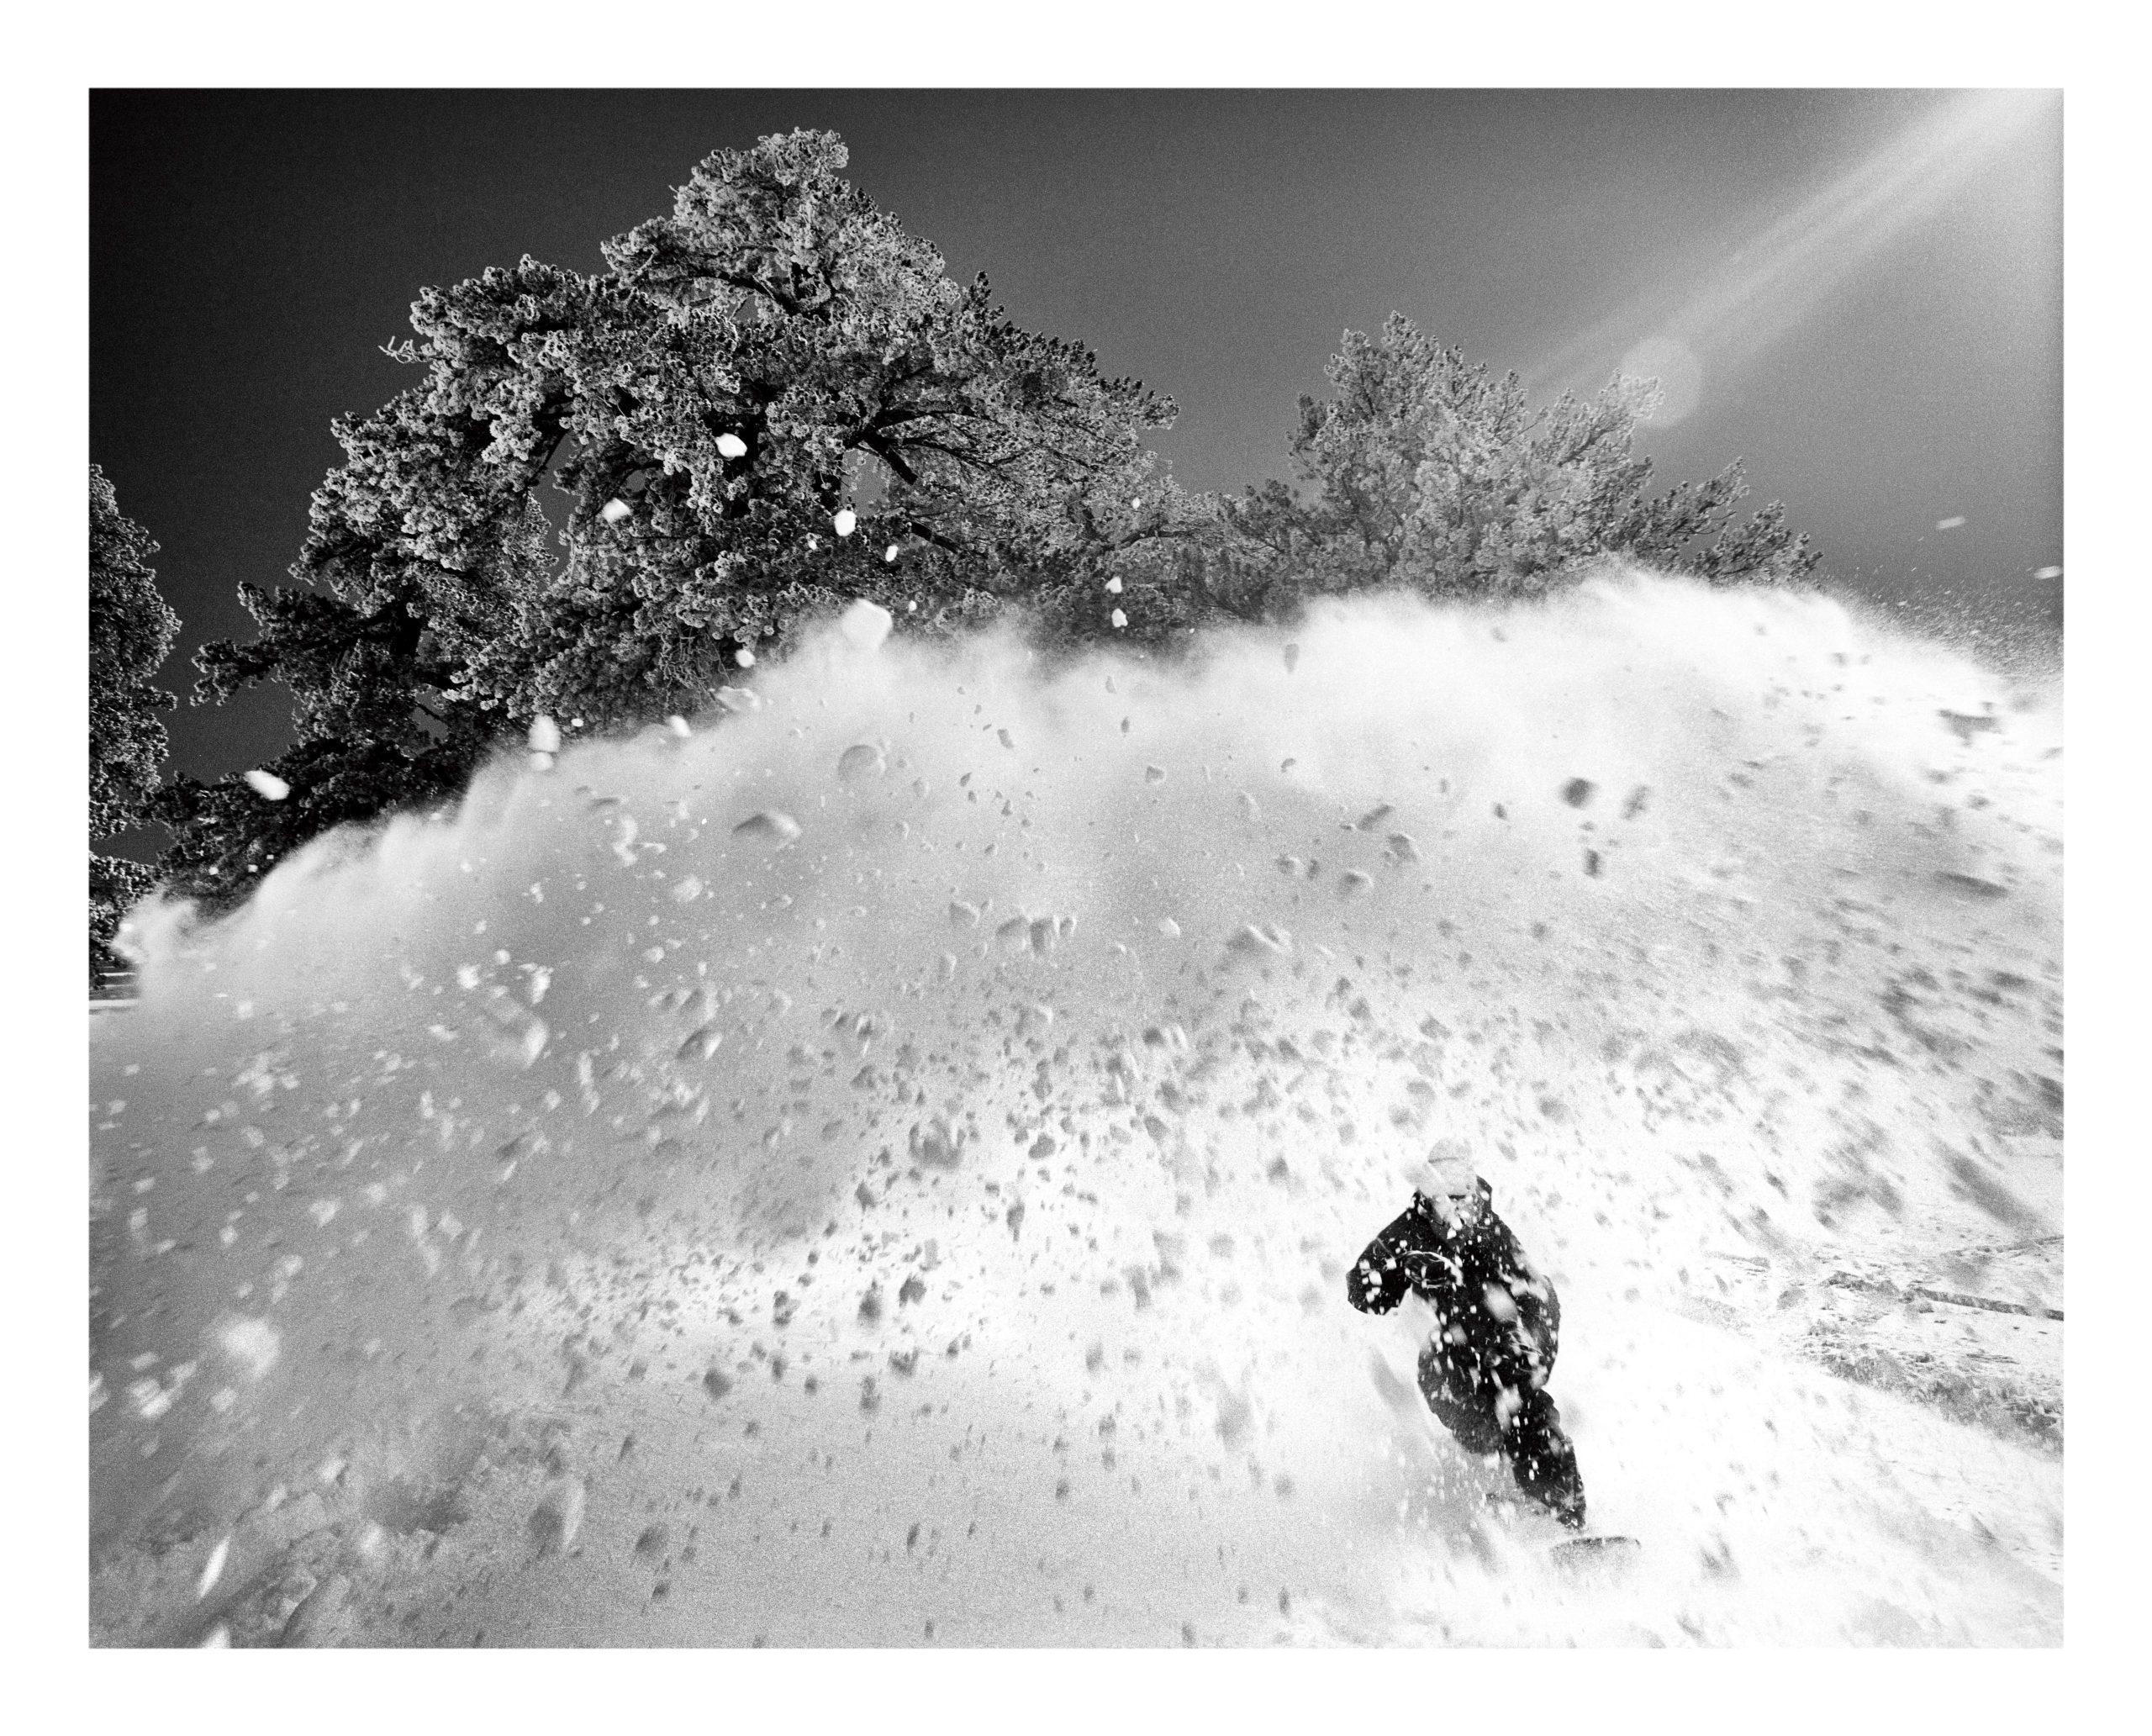 Niels Schack Victor Daviet Jerome Tanon Nils Mindnich snowboard